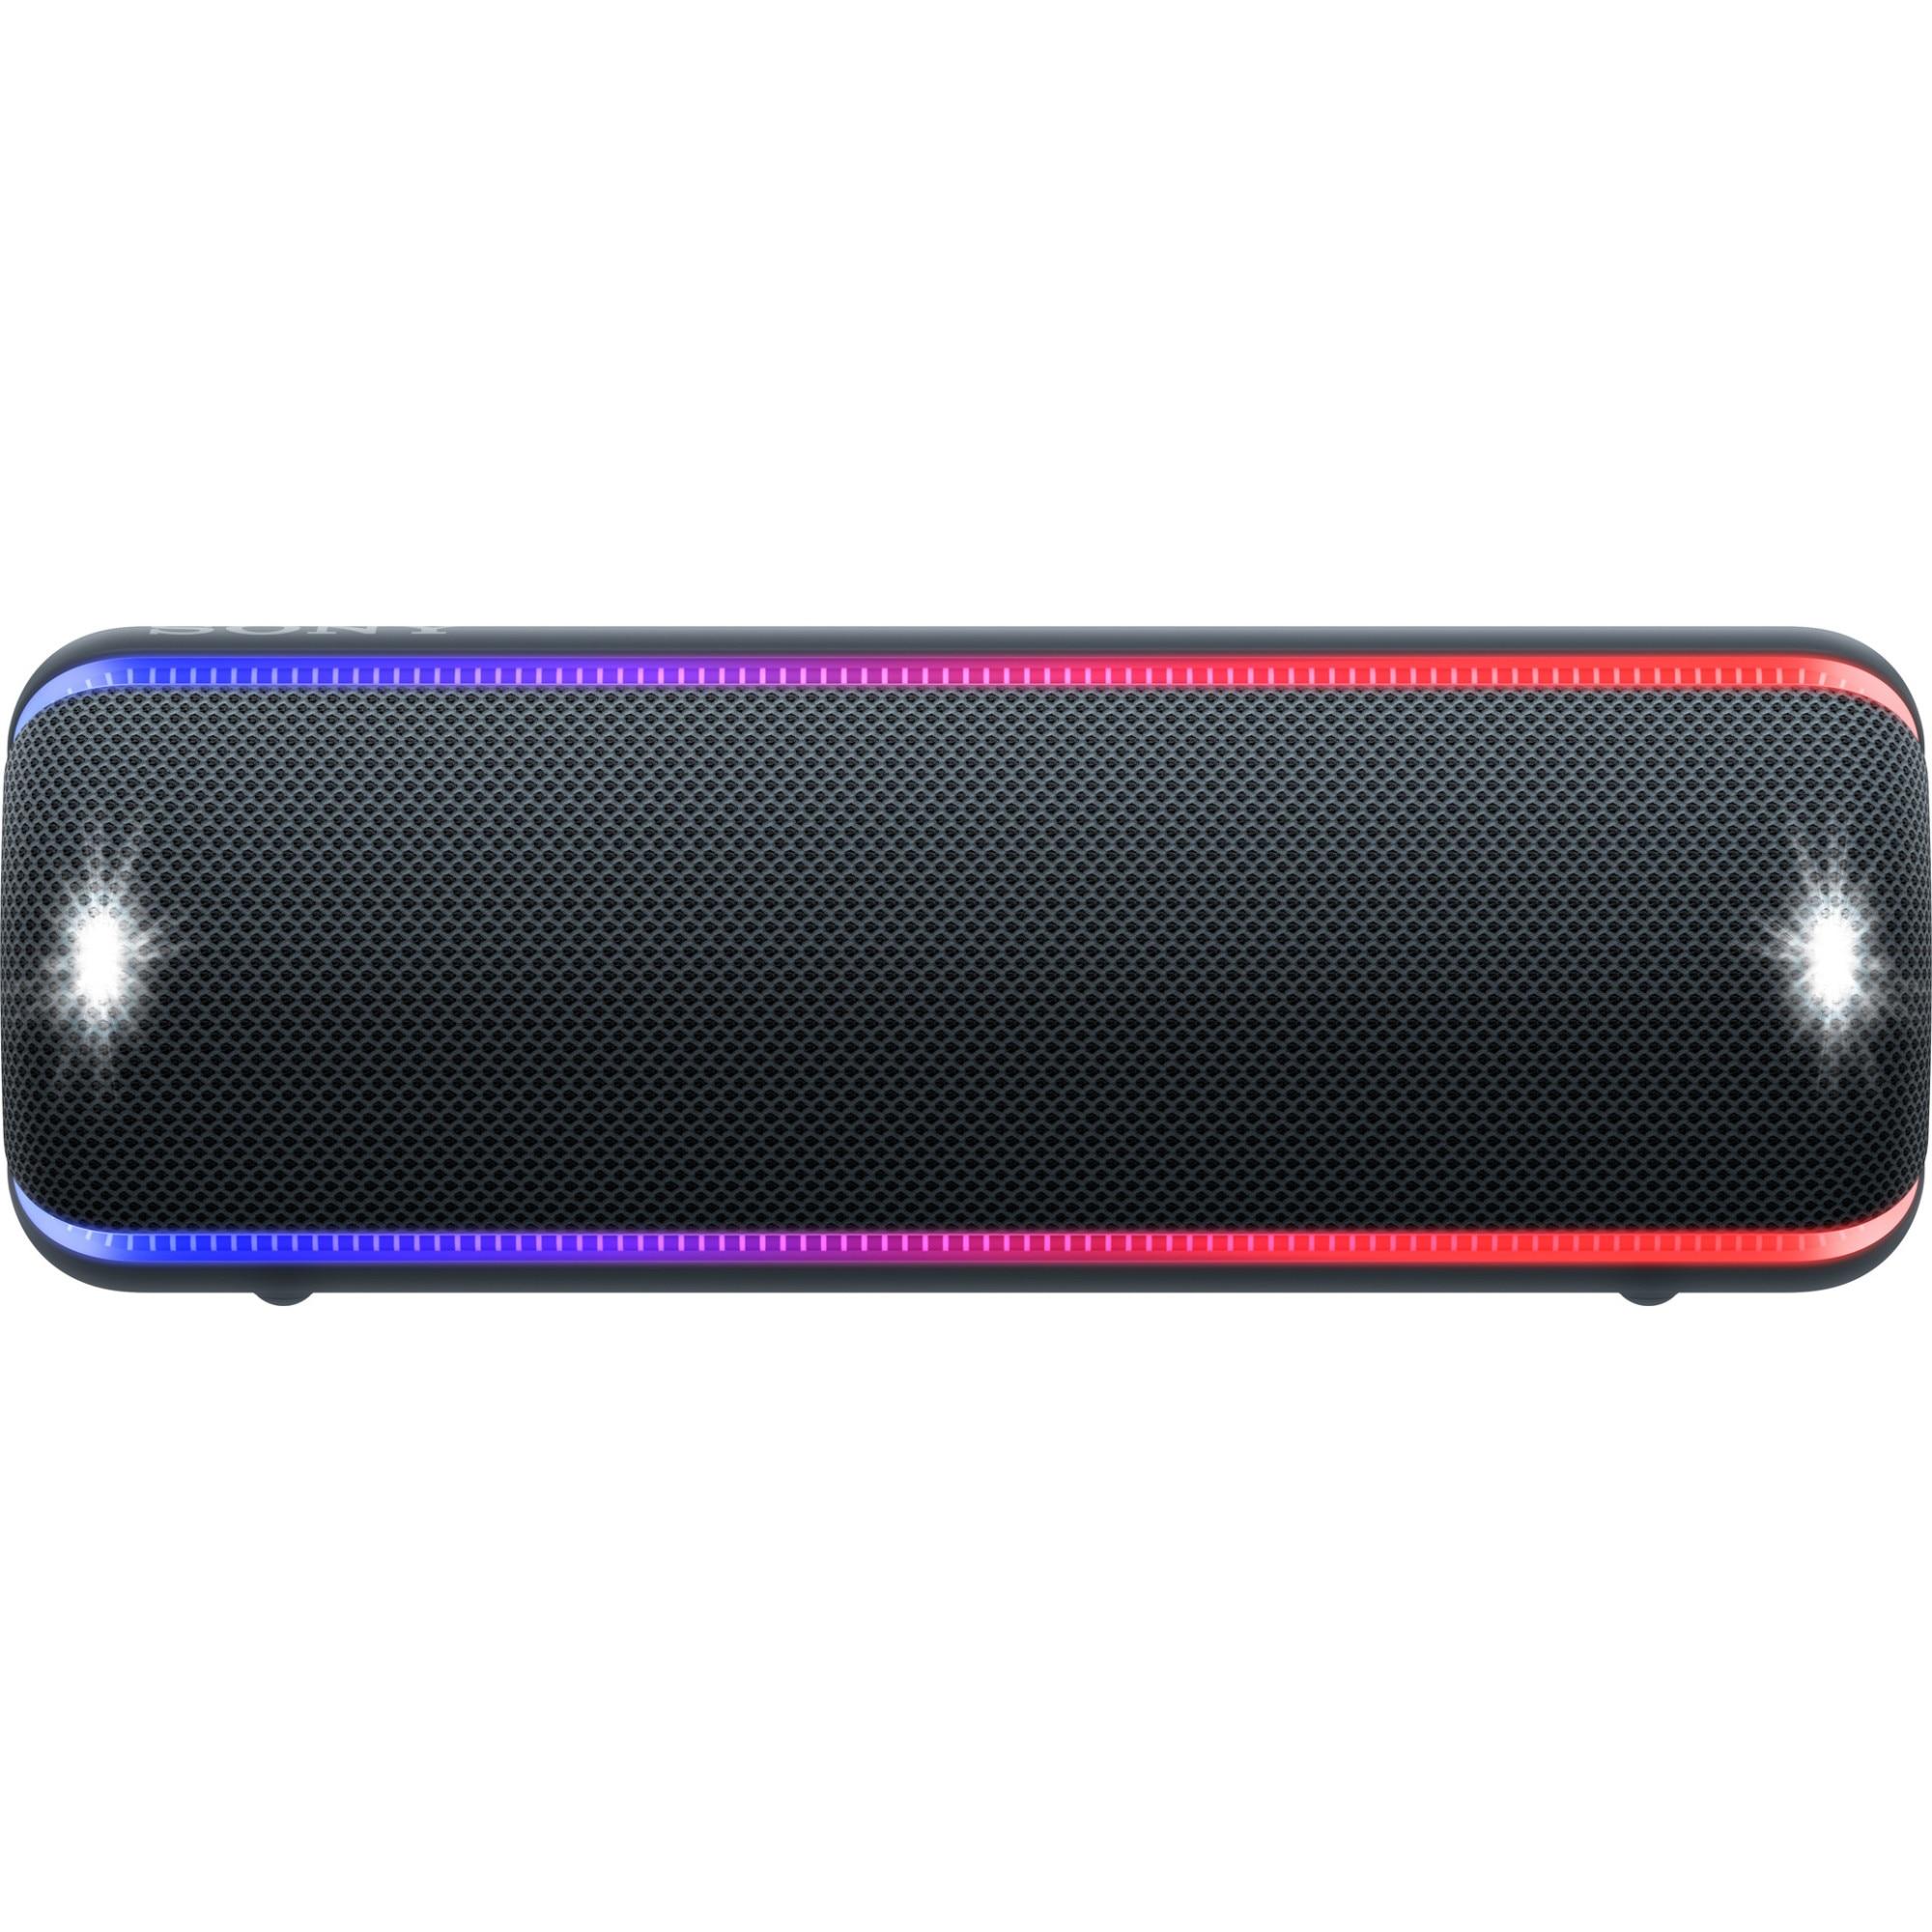 Fotografie Boxa portabila Sony SRS-XB32, Extra Bass, LIVE SOUND, Fiestable, Wireless Party Chain, Party Booster, Efect de lumini, Rezistenta la apa IP67, Bluetooth 4.2, NFC, Autonomie 24 ore, USB cu functie de incarcare, Negru